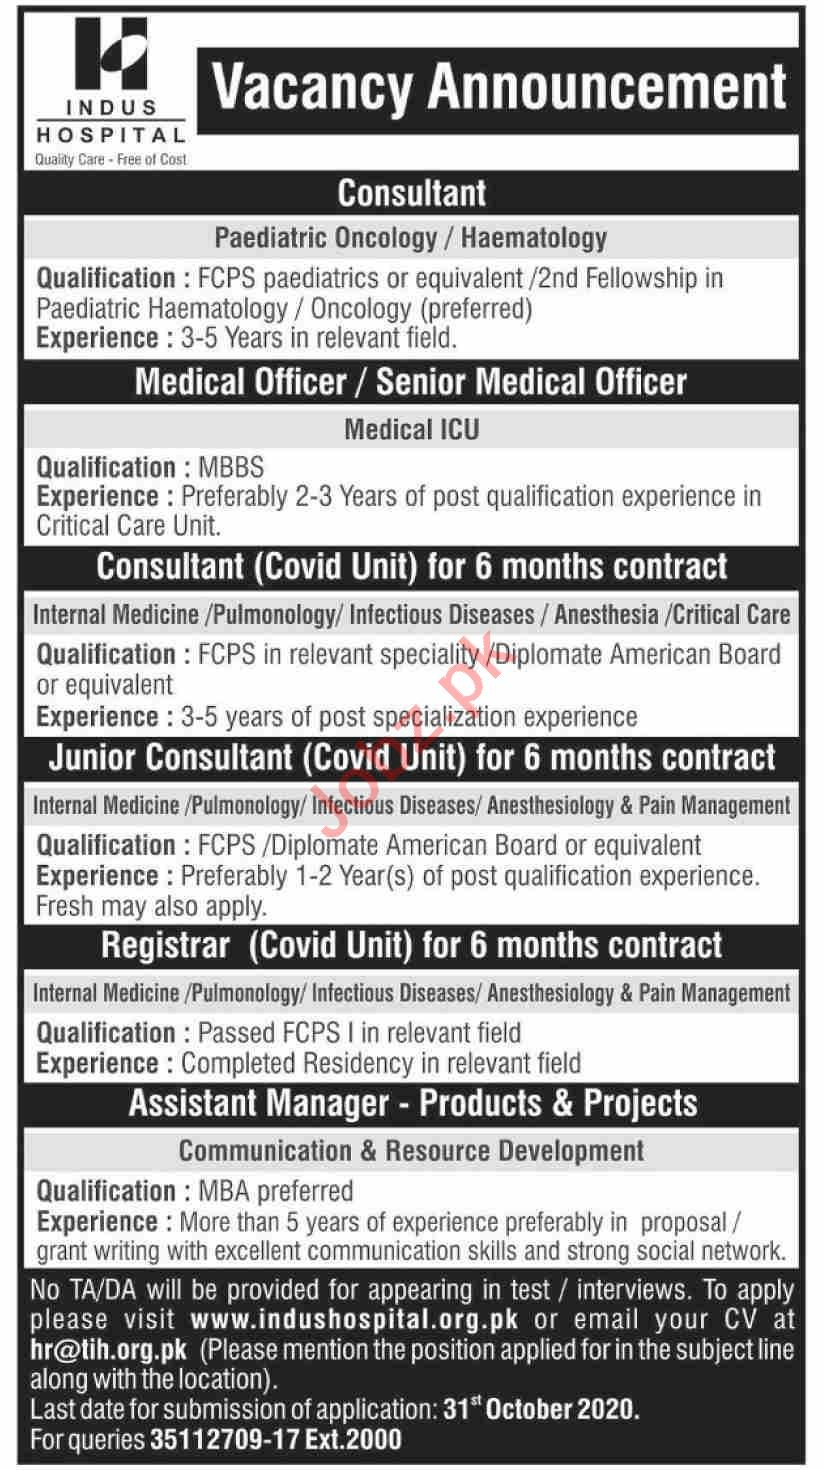 Indus Hospital Jobs 2020 for Medical Consultant & Registrar